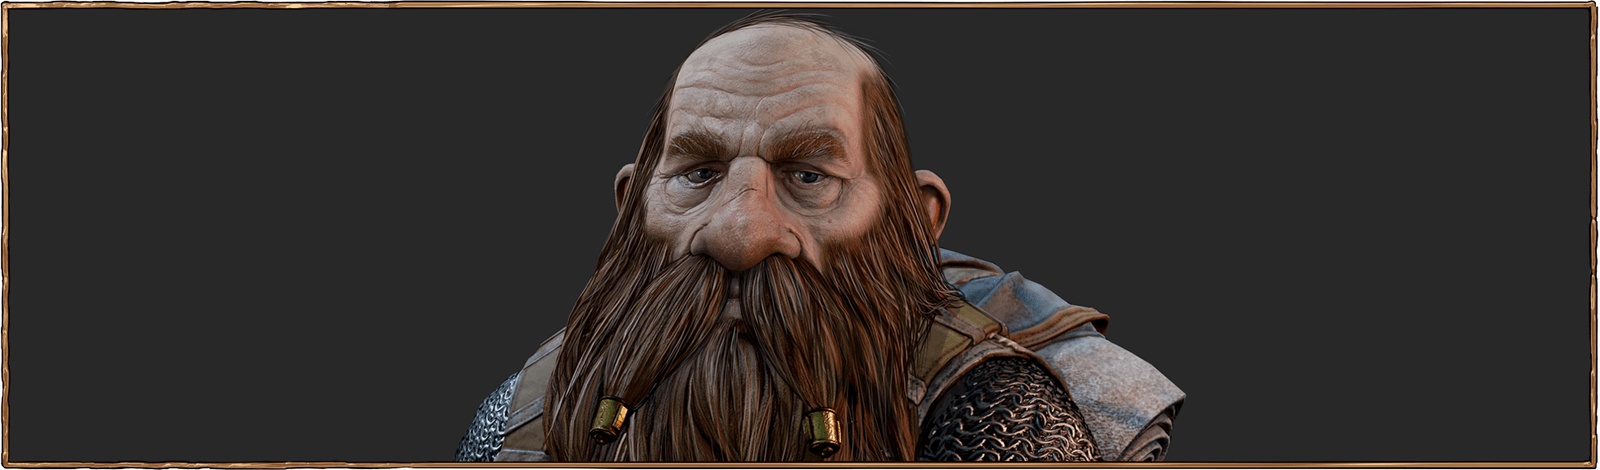 Warhammer: End Times – Vermintide Reveals The Dwarf Ranger News Header